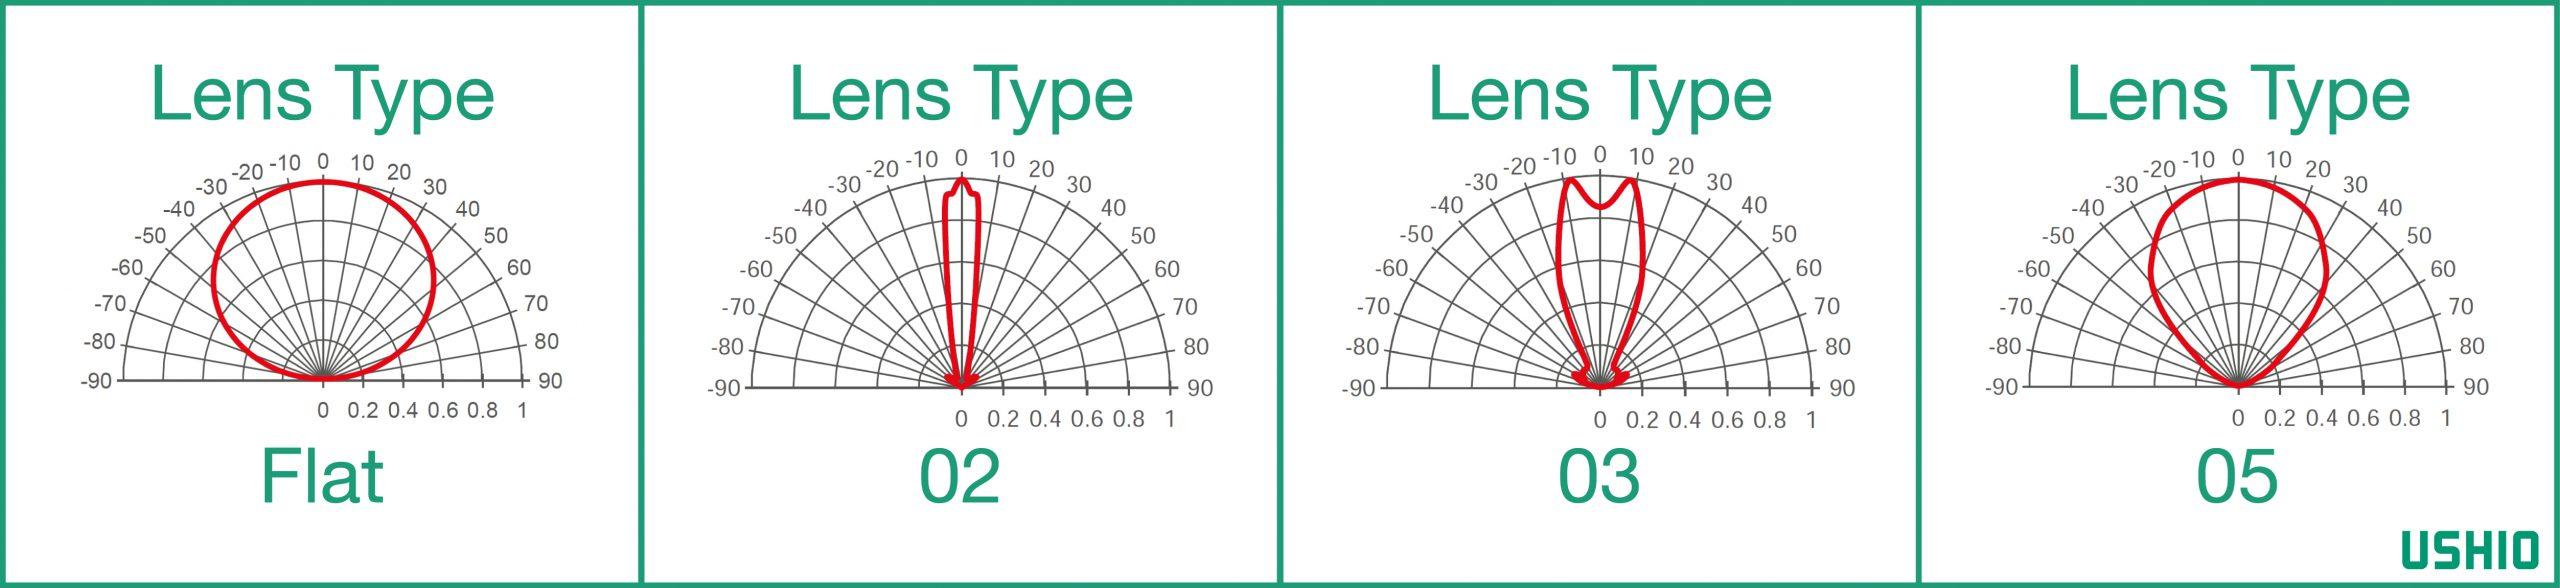 Lens Types - Output